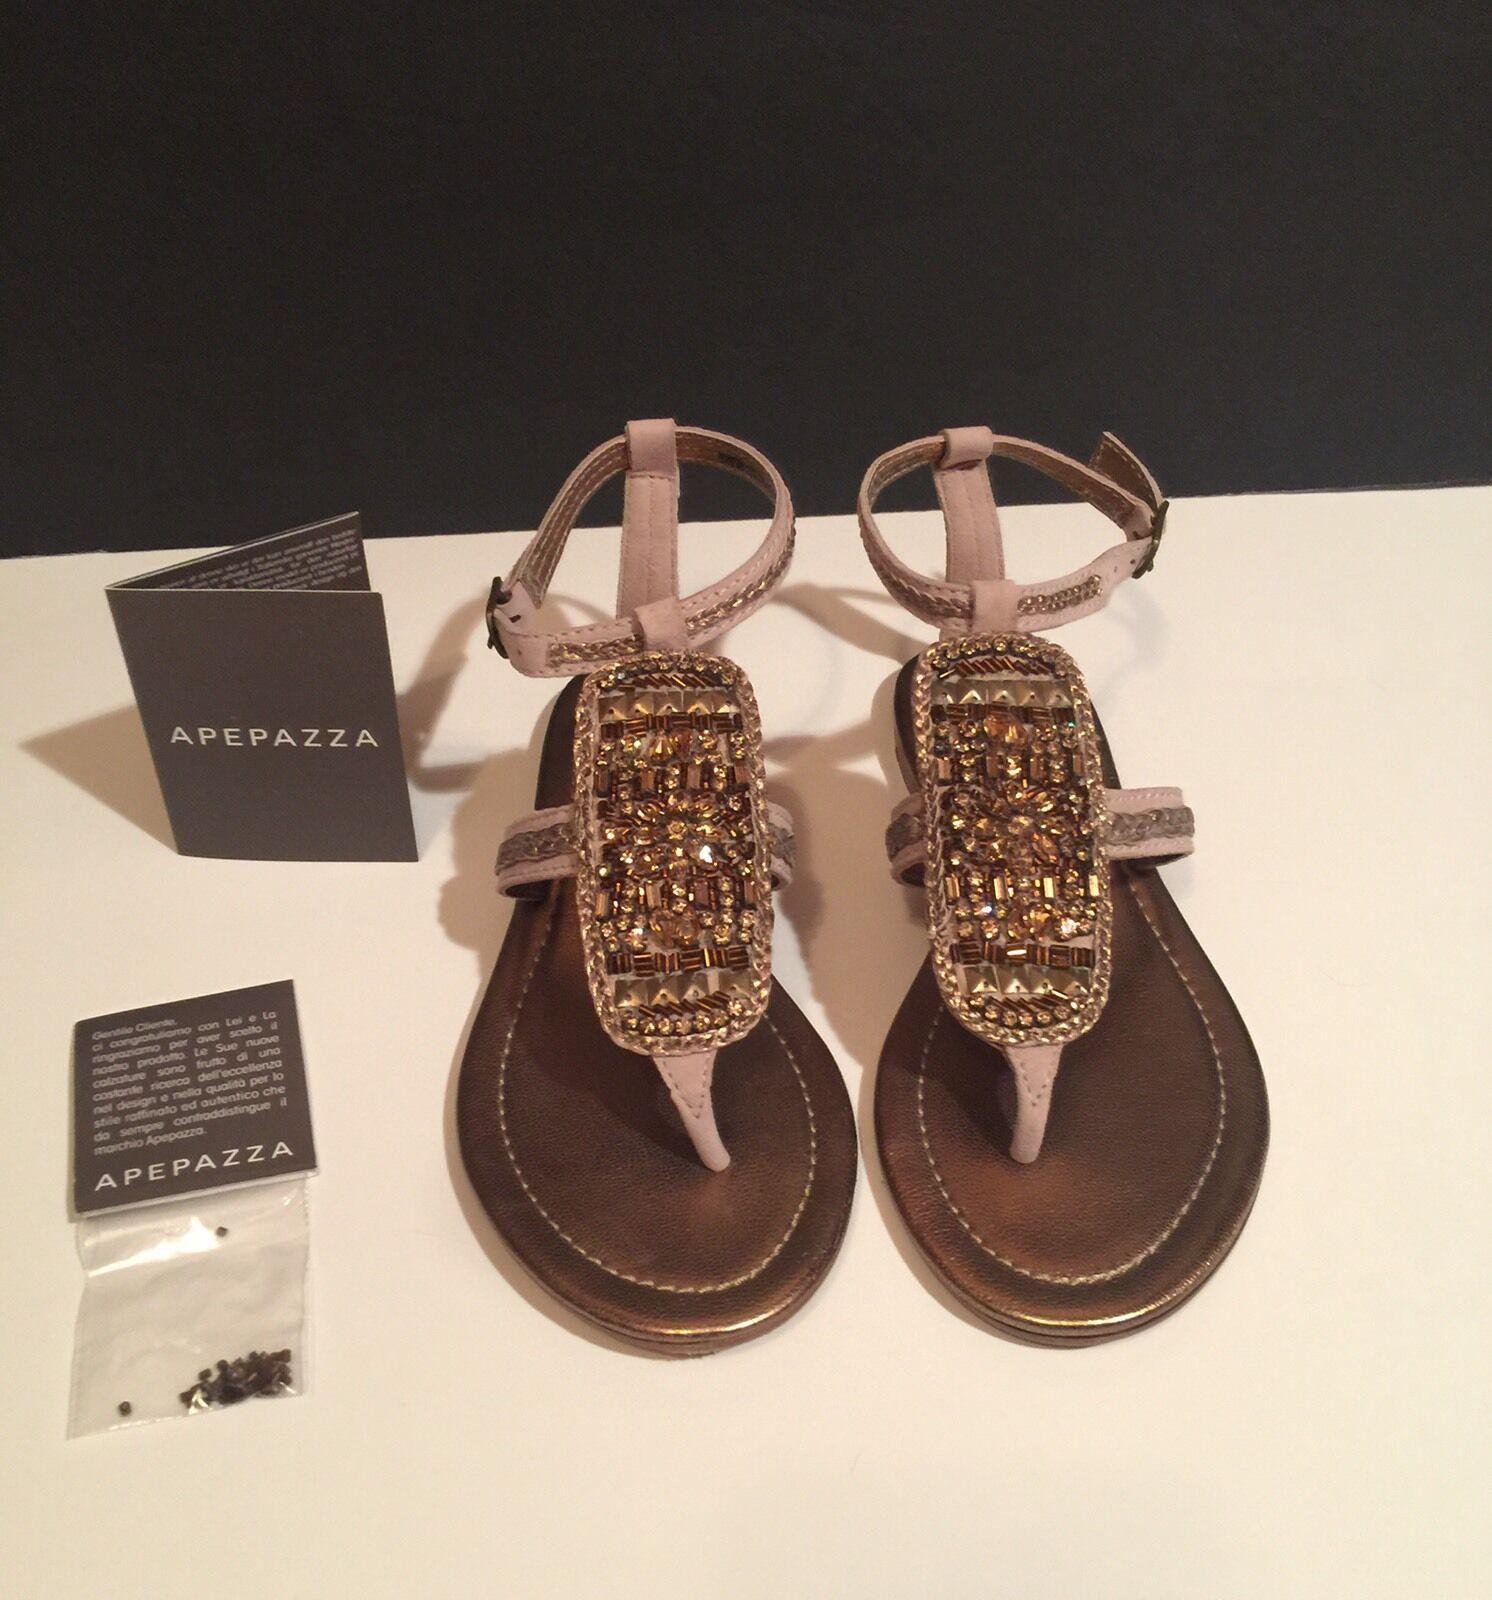 Apepazza Canarie Sand Embellished Sandals Runs Small Fits 7.5M NWB